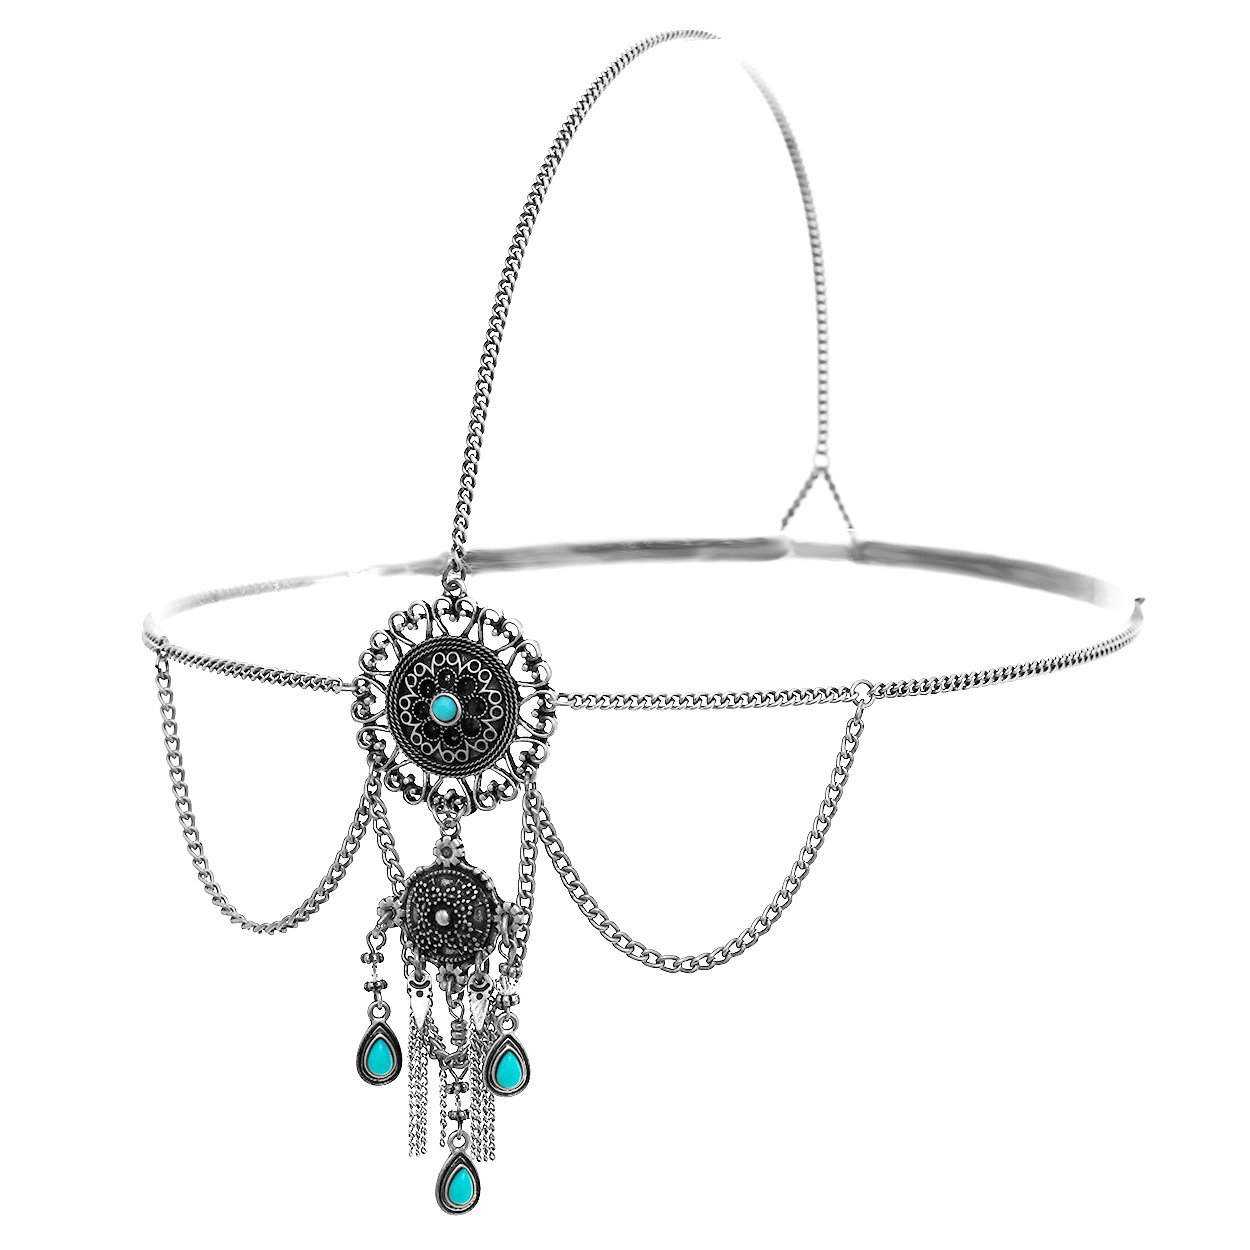 Rosemarie Collections Women's Boho Style Fringe Head Chain Headband (Silver Tone)